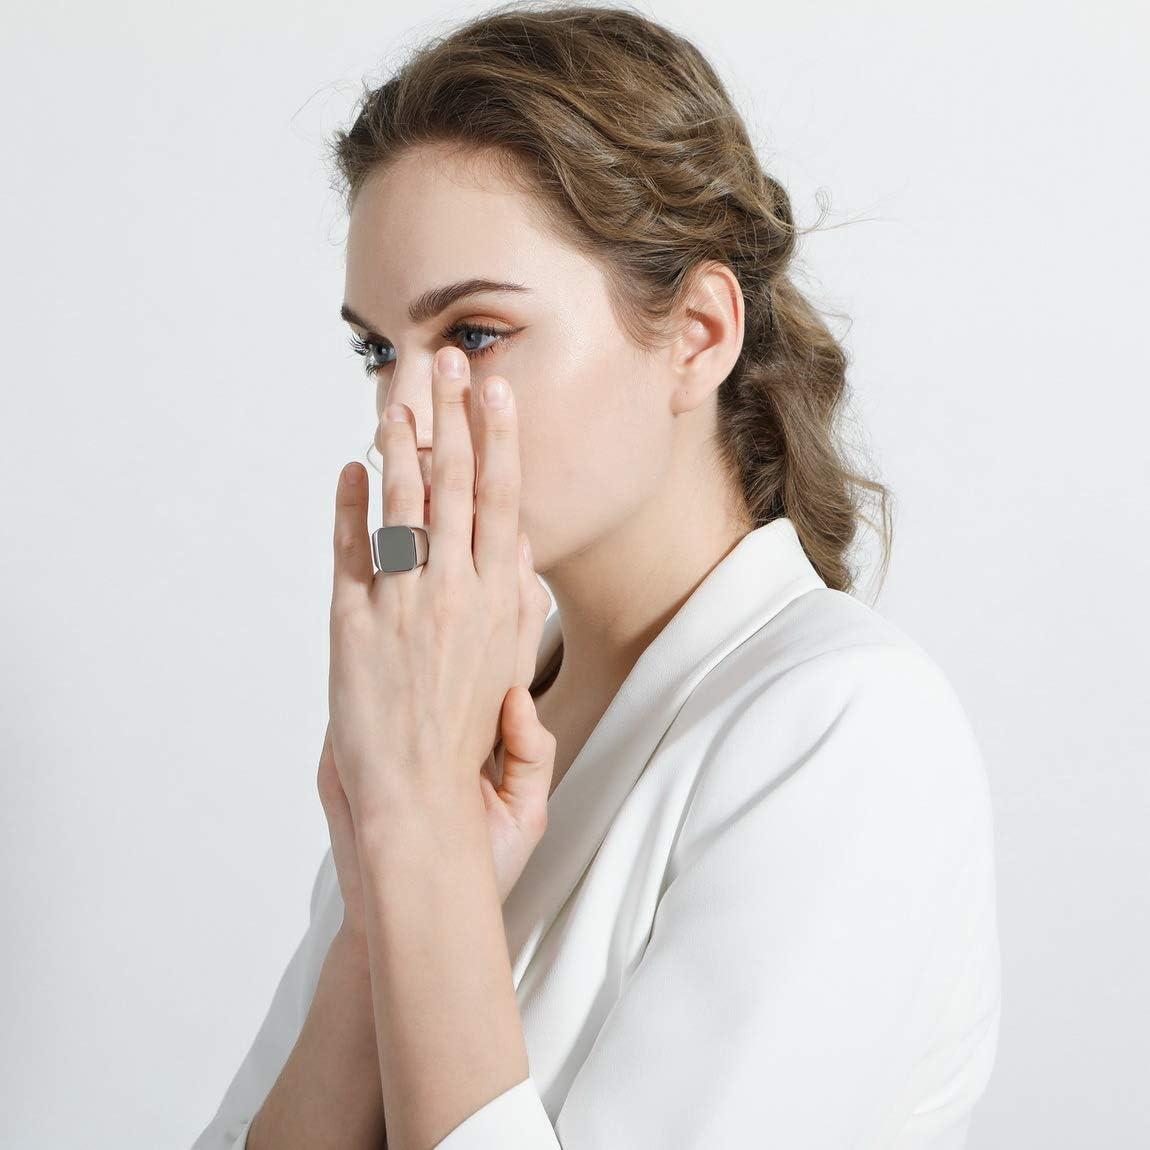 VIBOOS Custom Engraved Initial Monogram Signet Ring for Men Women Boys Mens Rings Stainless Steel Bundle with Ring Size Adjusters